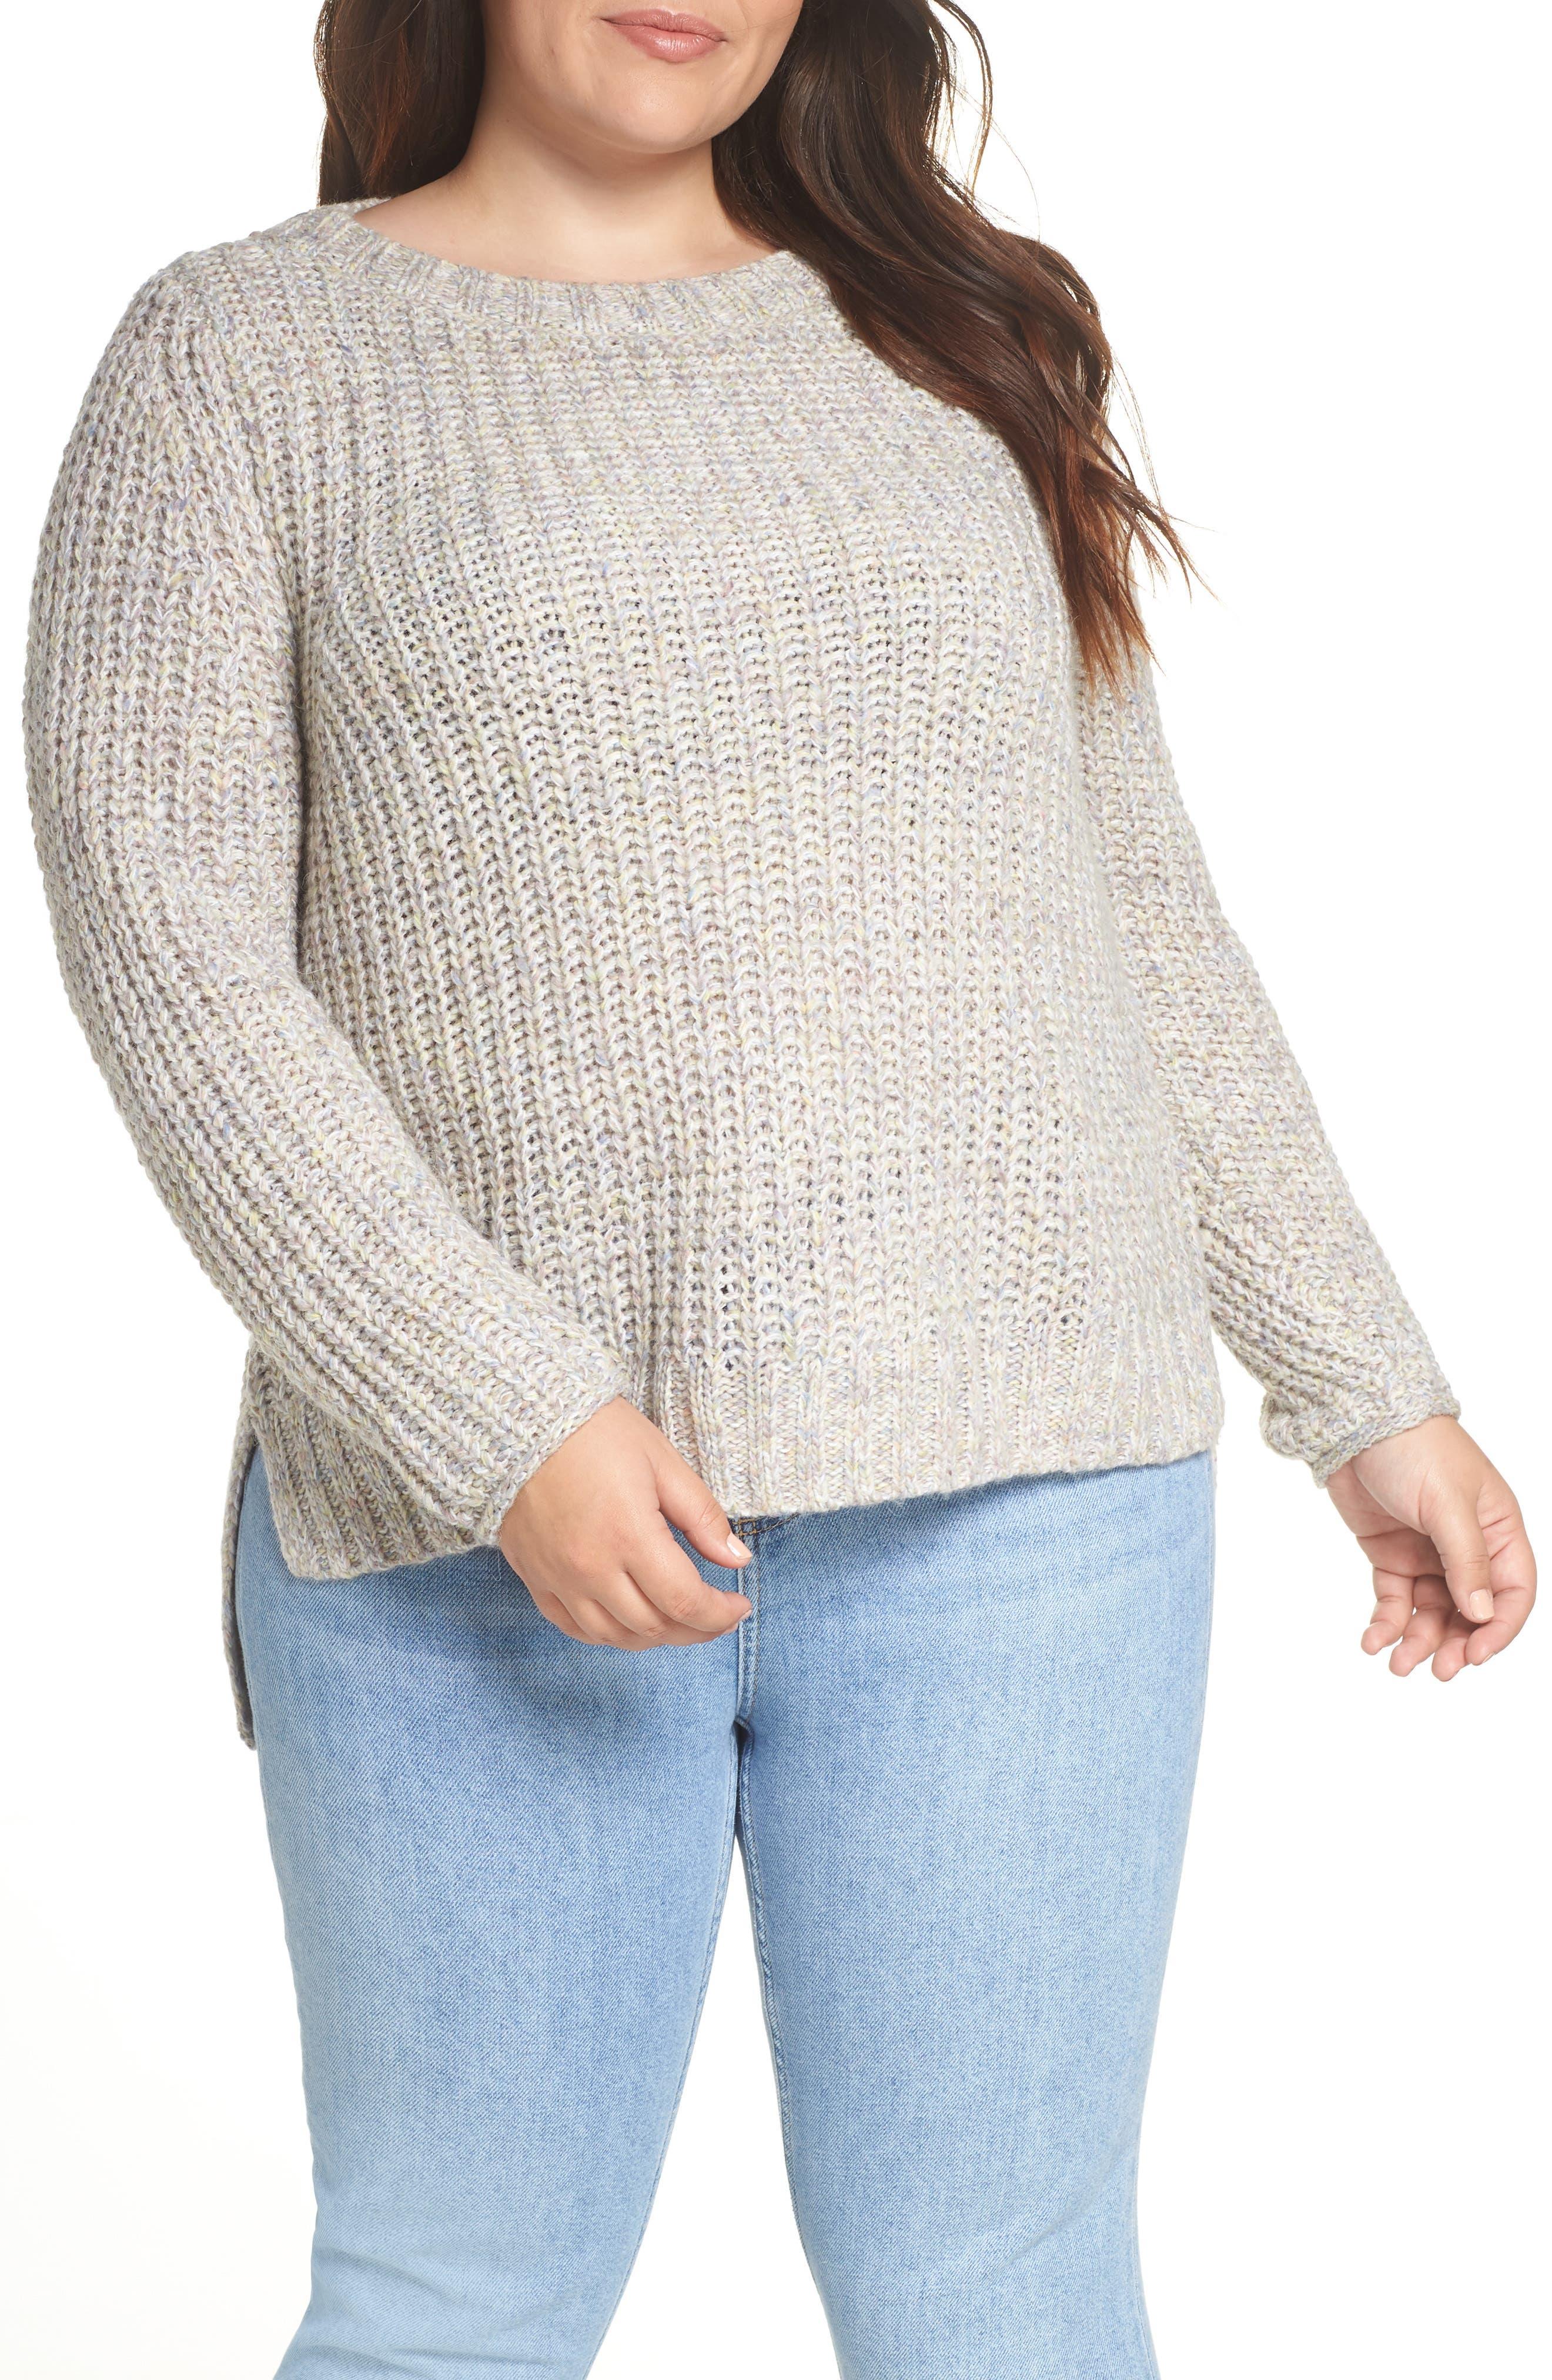 Boat Neck Sweater,                             Main thumbnail 1, color,                             BEIGE POPCORN PATTERN